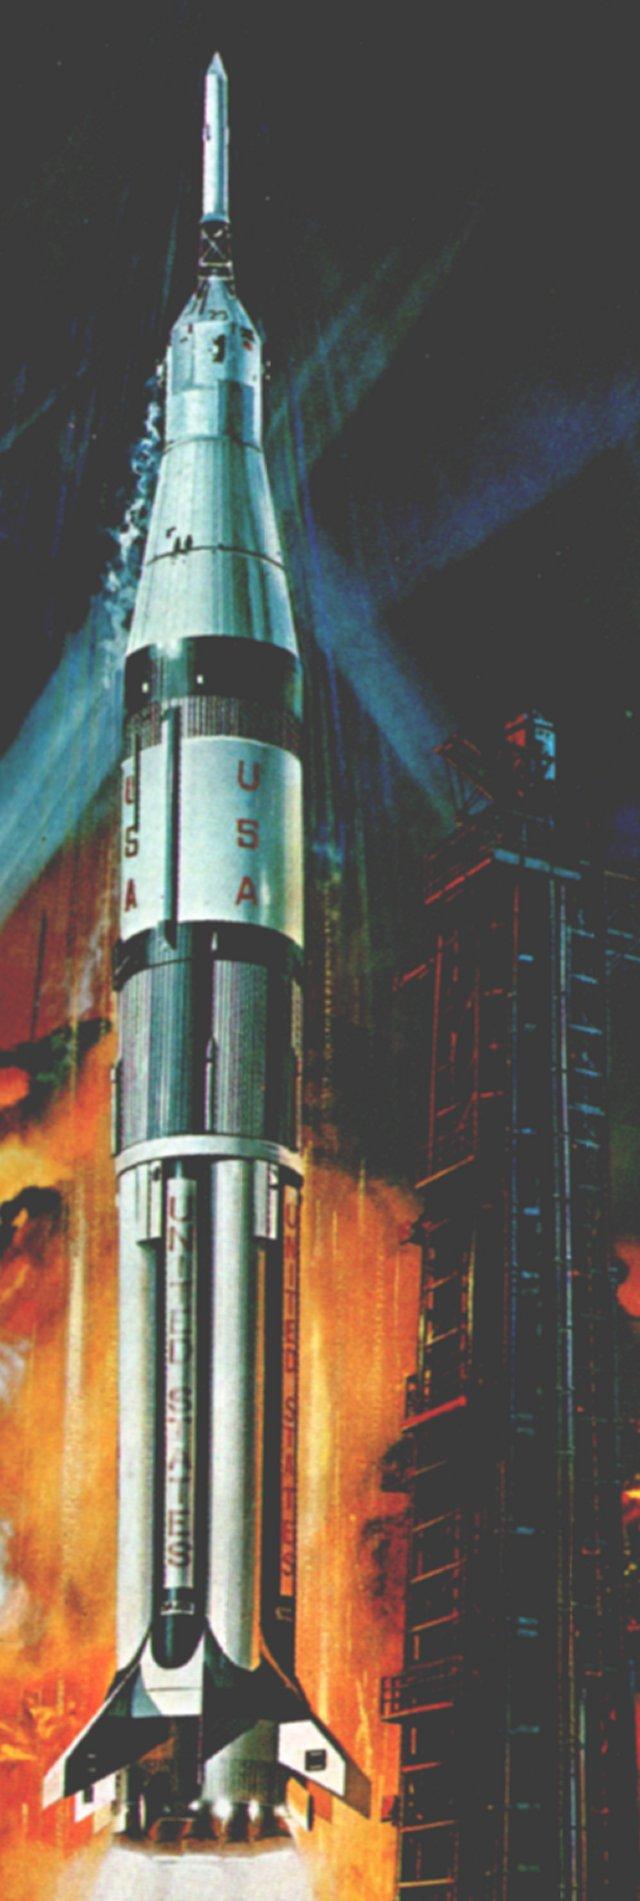 Apollo Test Flights Apollo Test Flights as